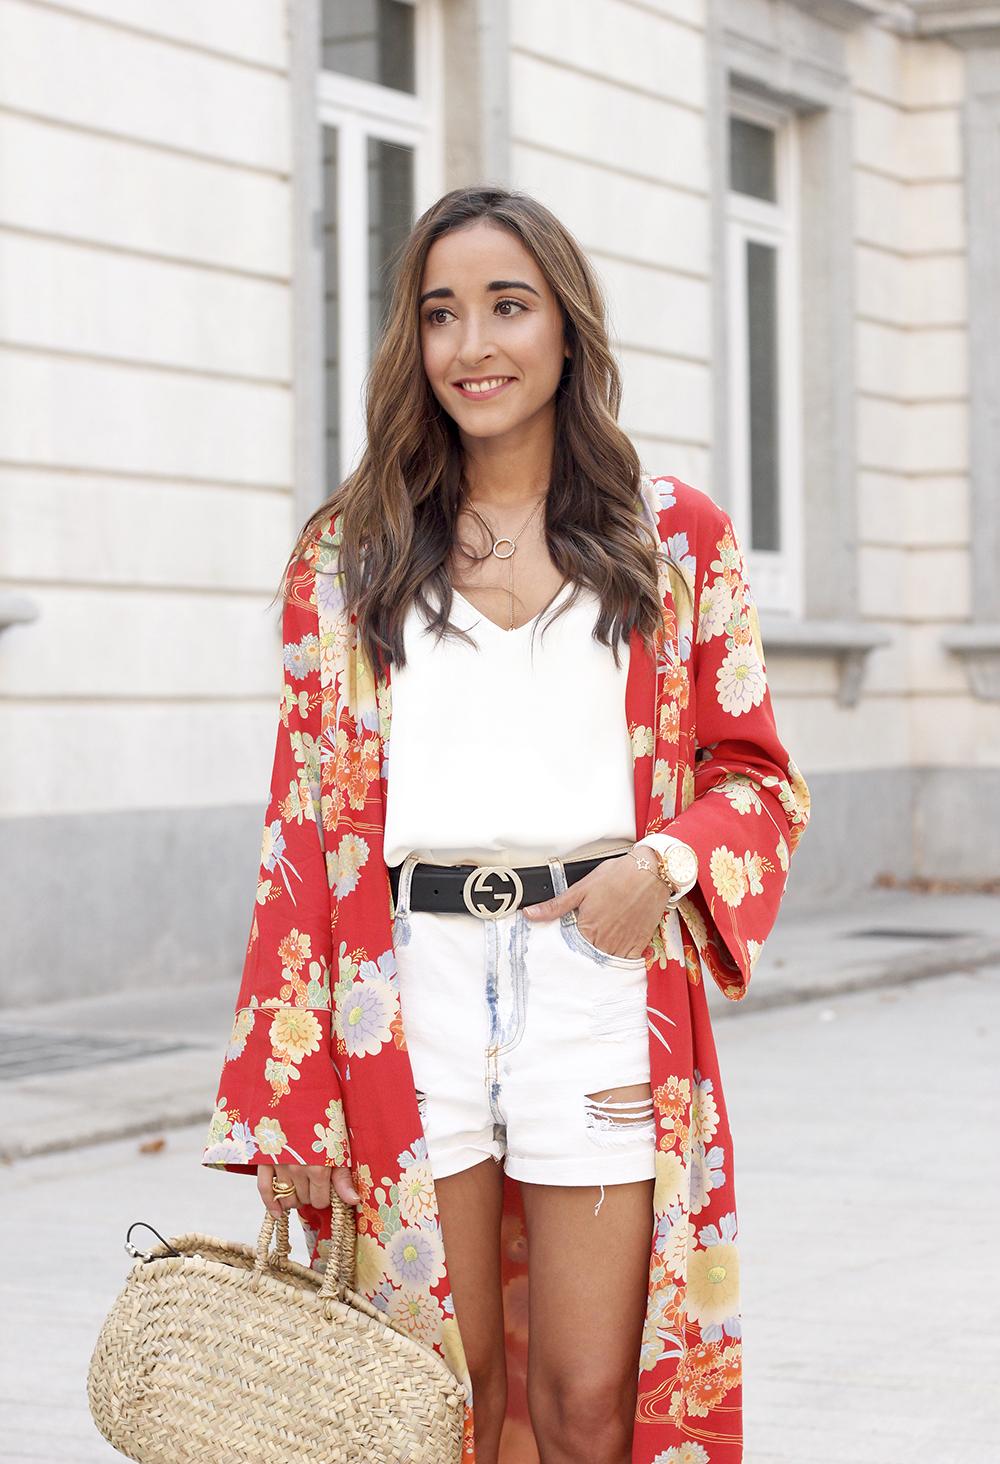 Flowered maxi kimono denim short heels summer girl style fashion12